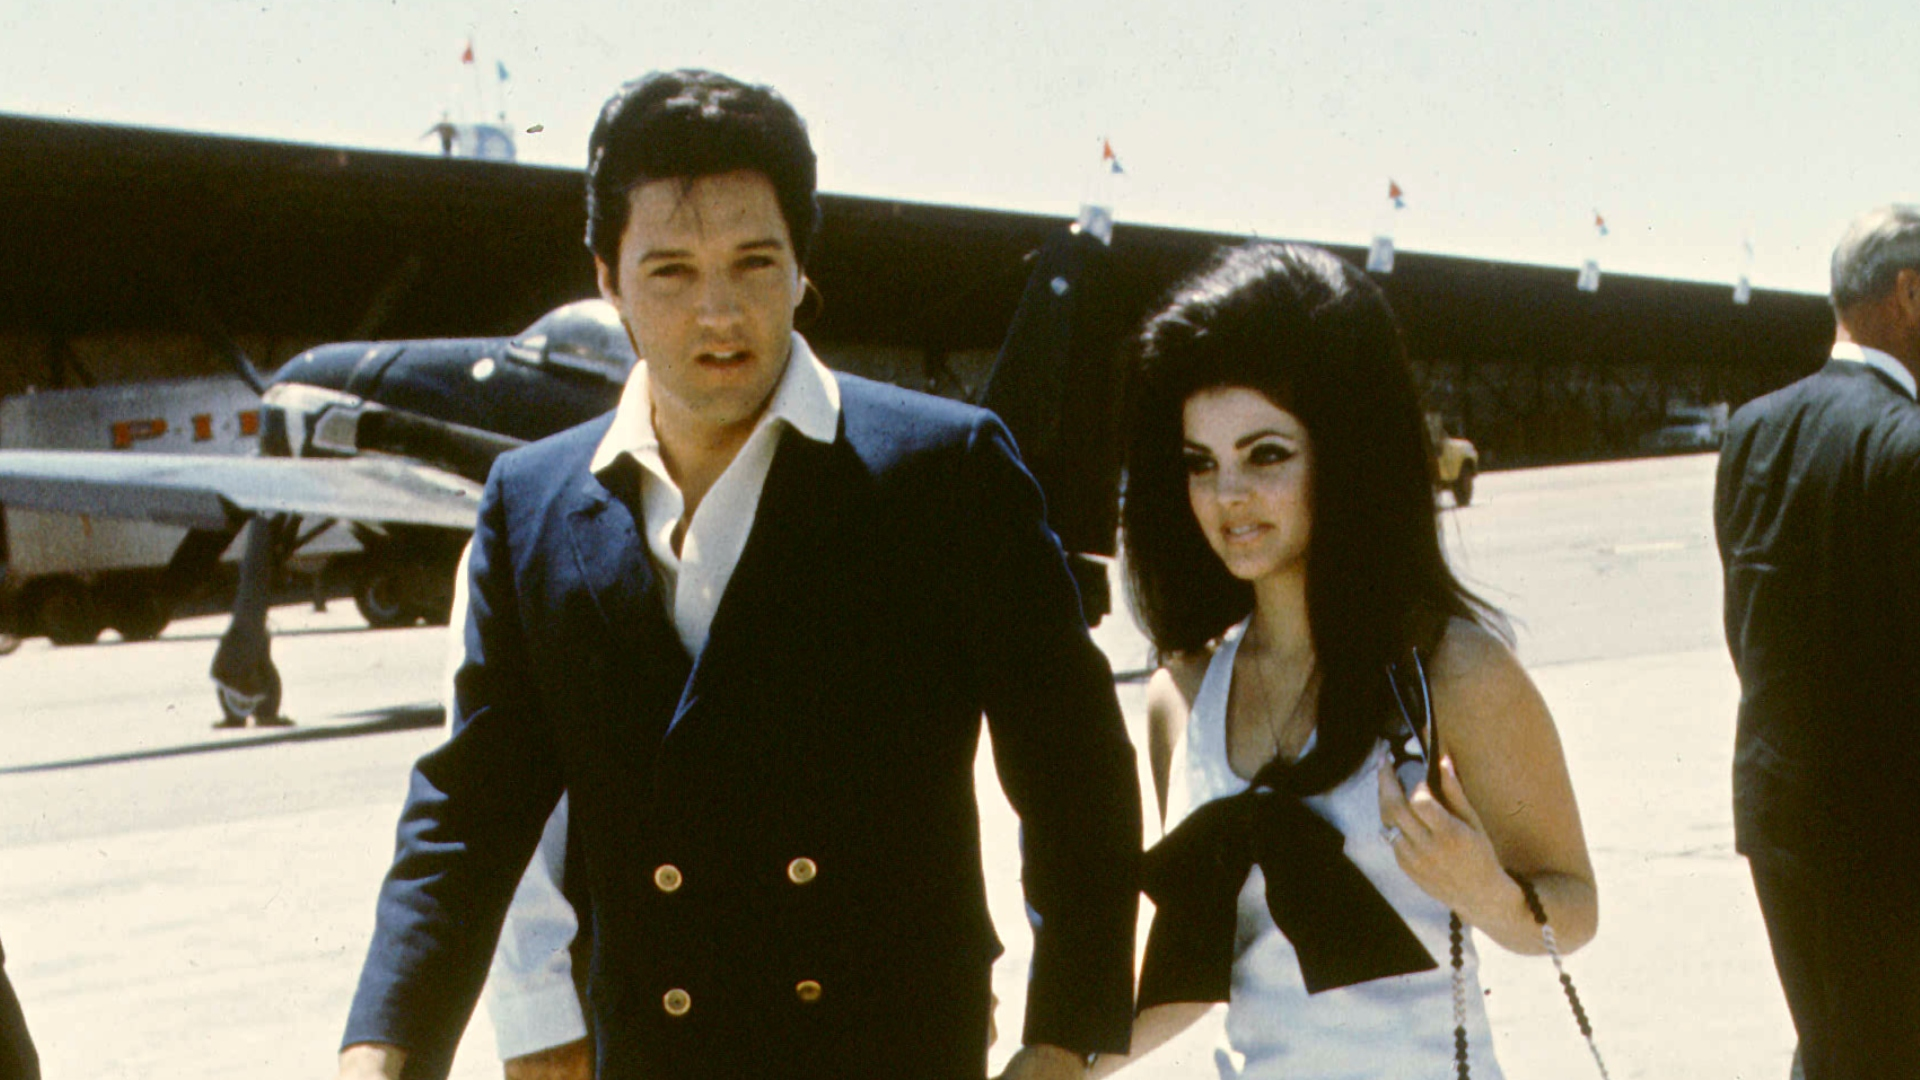 Inside Elvis & Priscilla Presley's $30 Million Glamorous Beverly Hills Mansion